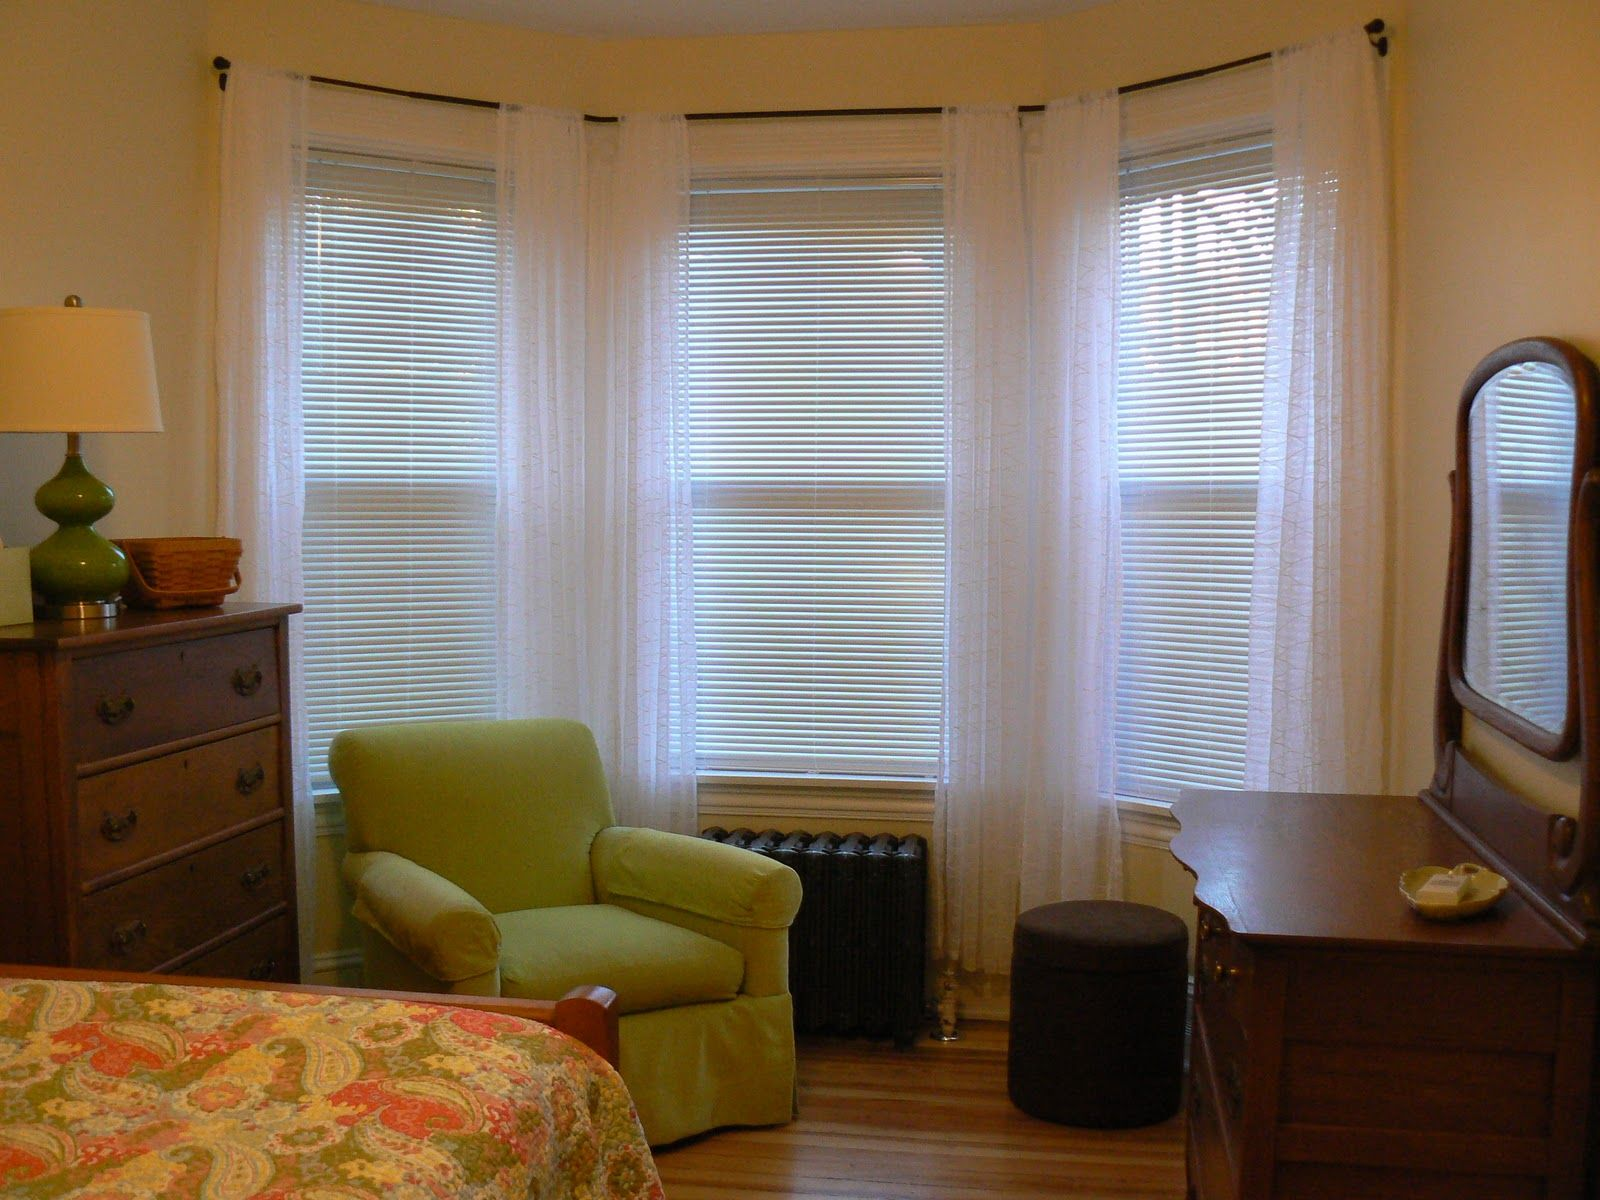 Bay window curtain ideas bedroom - Bay Window Curtain Ideas 17 Best Images About Curtain Ideas On Bay Window